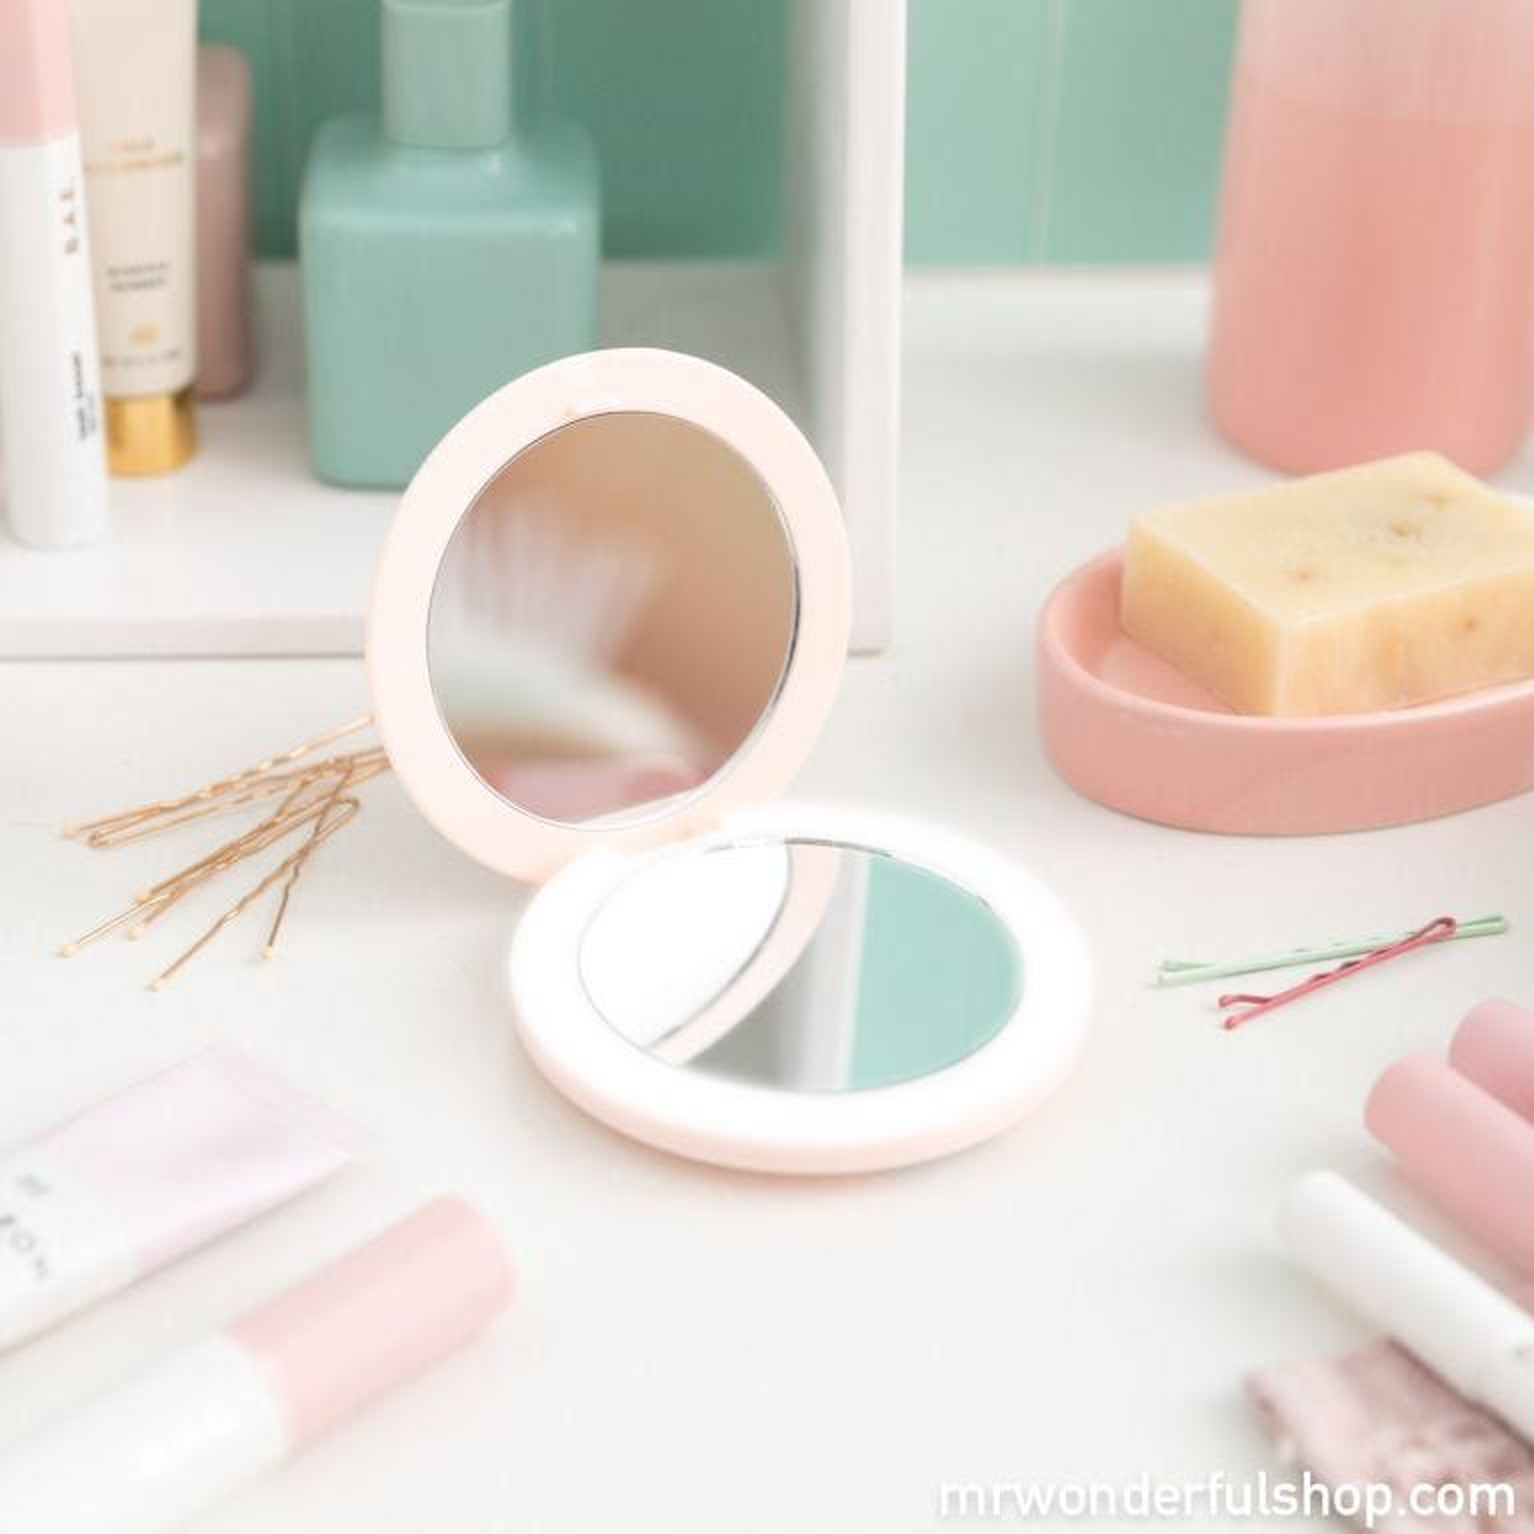 Compact makeup mirror - You look stunning!